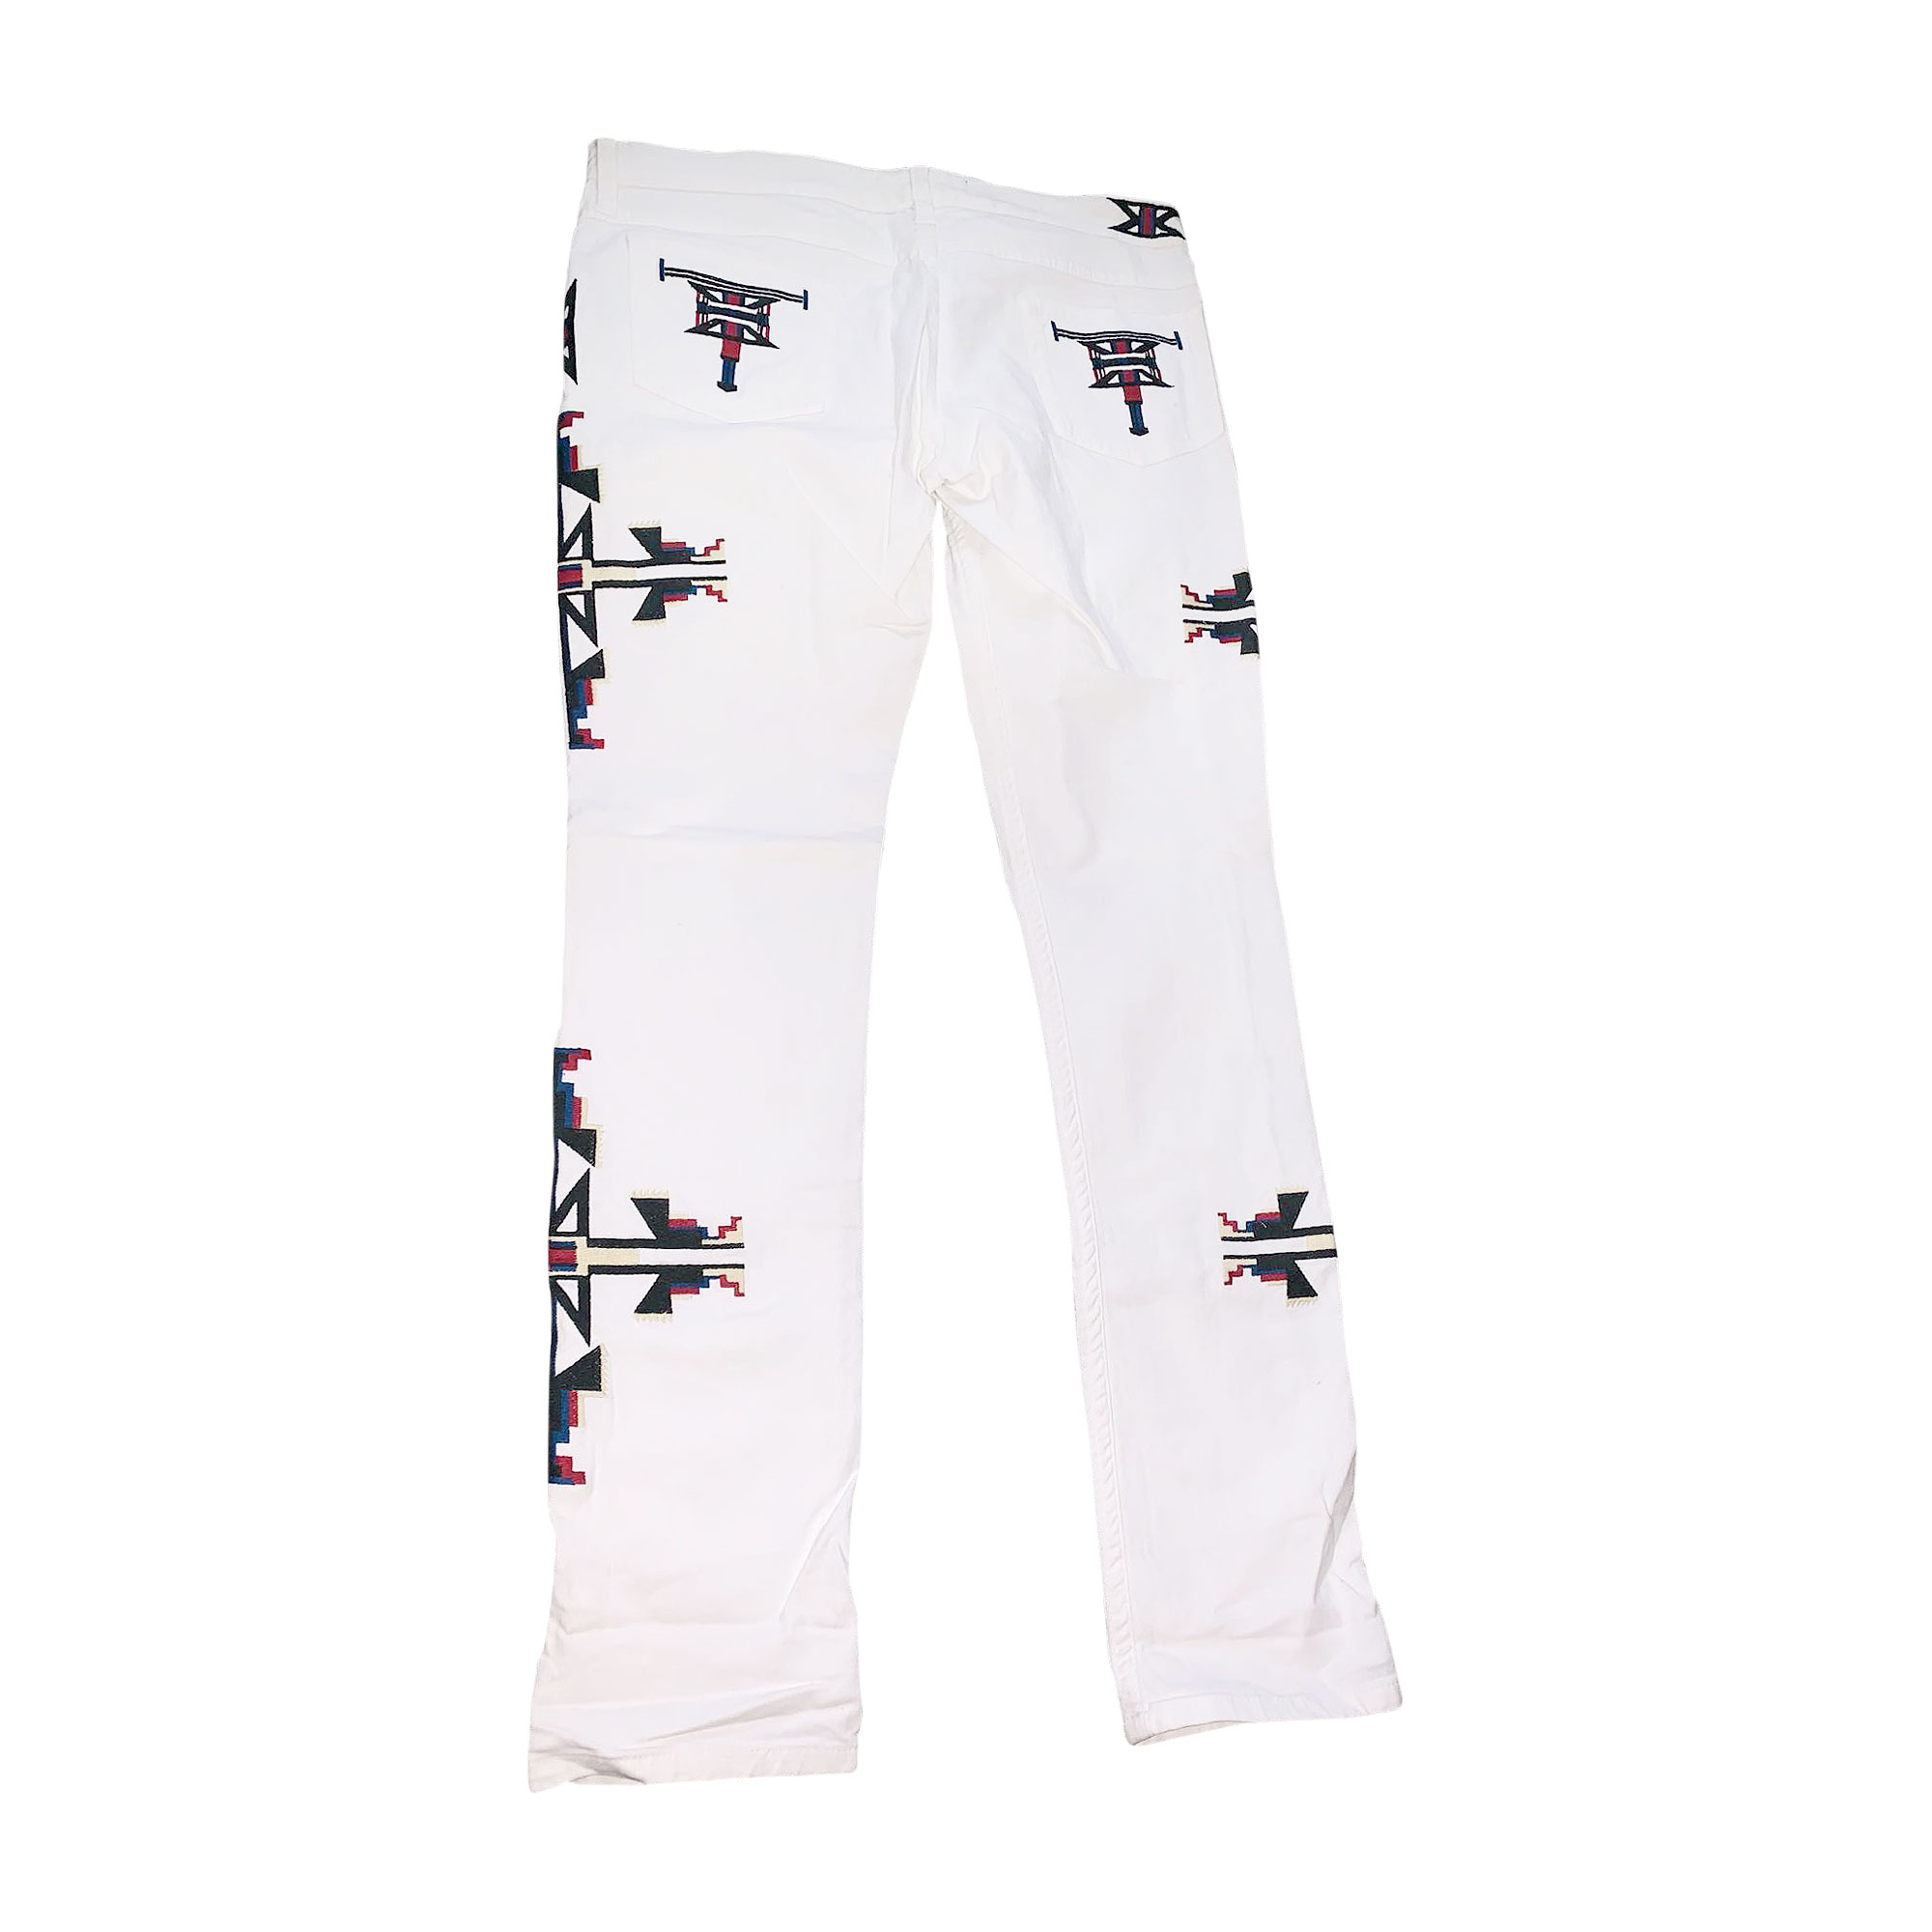 Jeans slim ISABEL MARANT Blanc, blanc cassé, écru